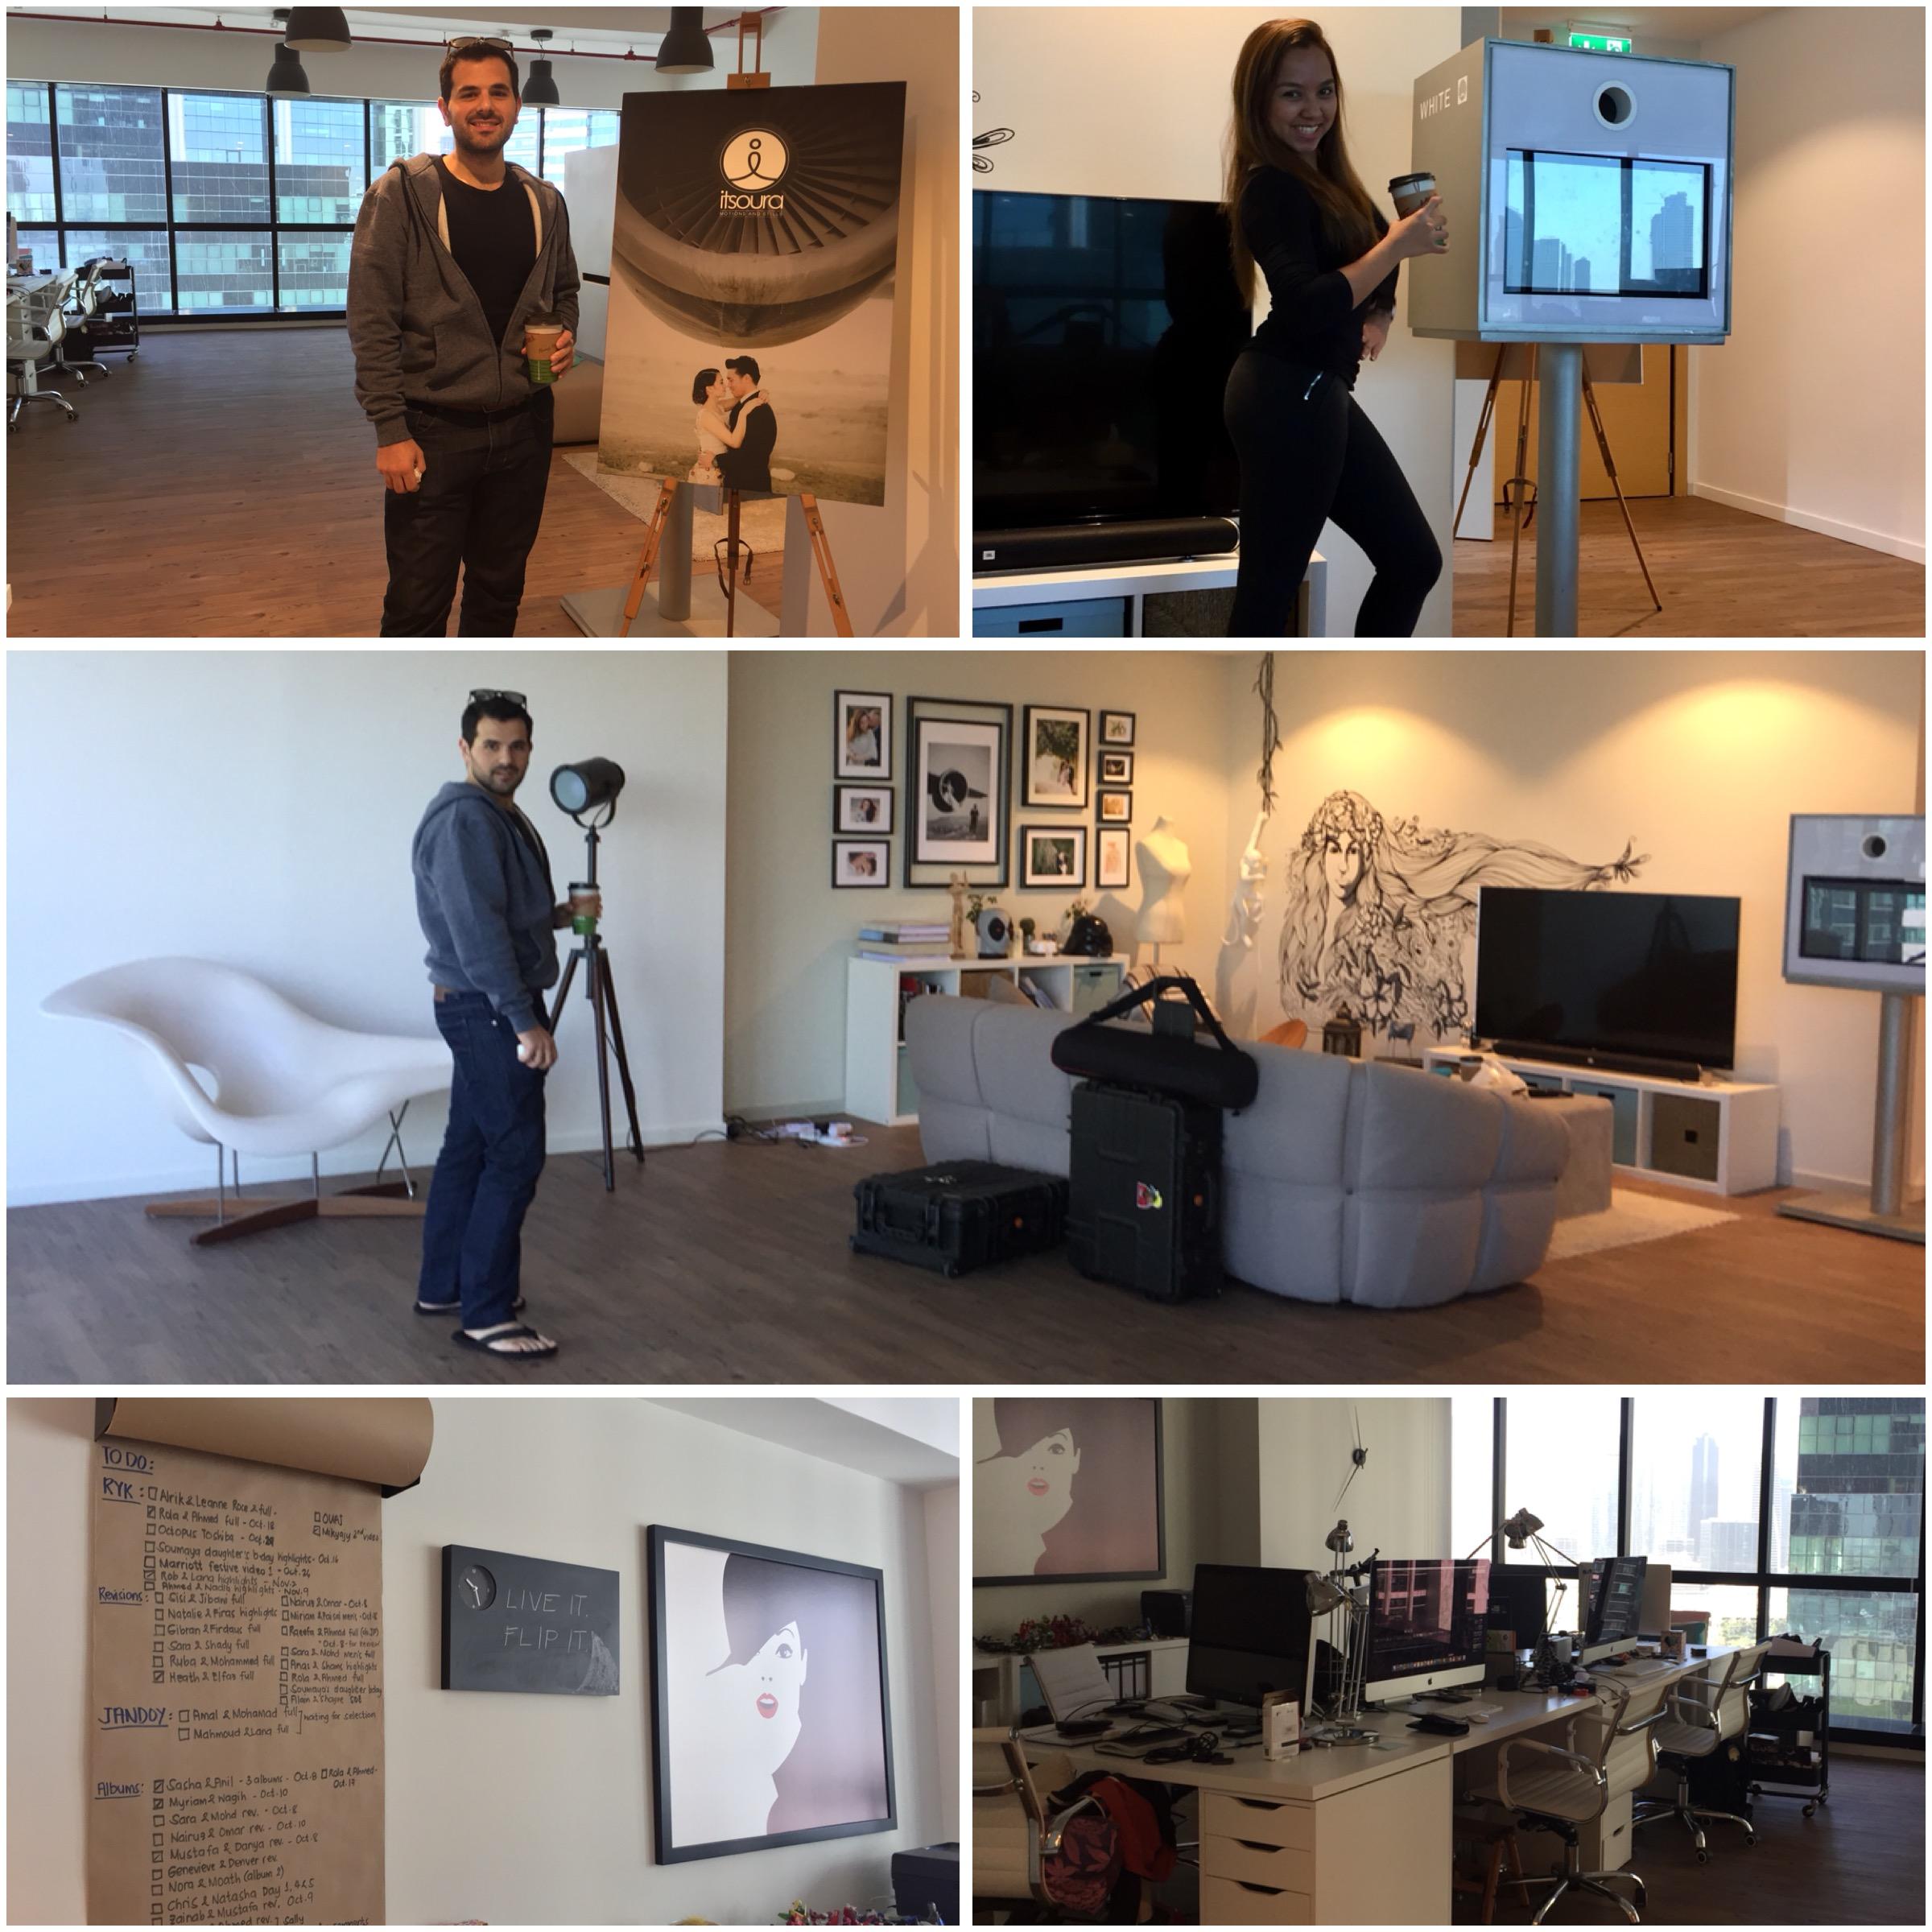 Visiting ItStudio's (Itsoura, Whitebox, Loud) Headquarters